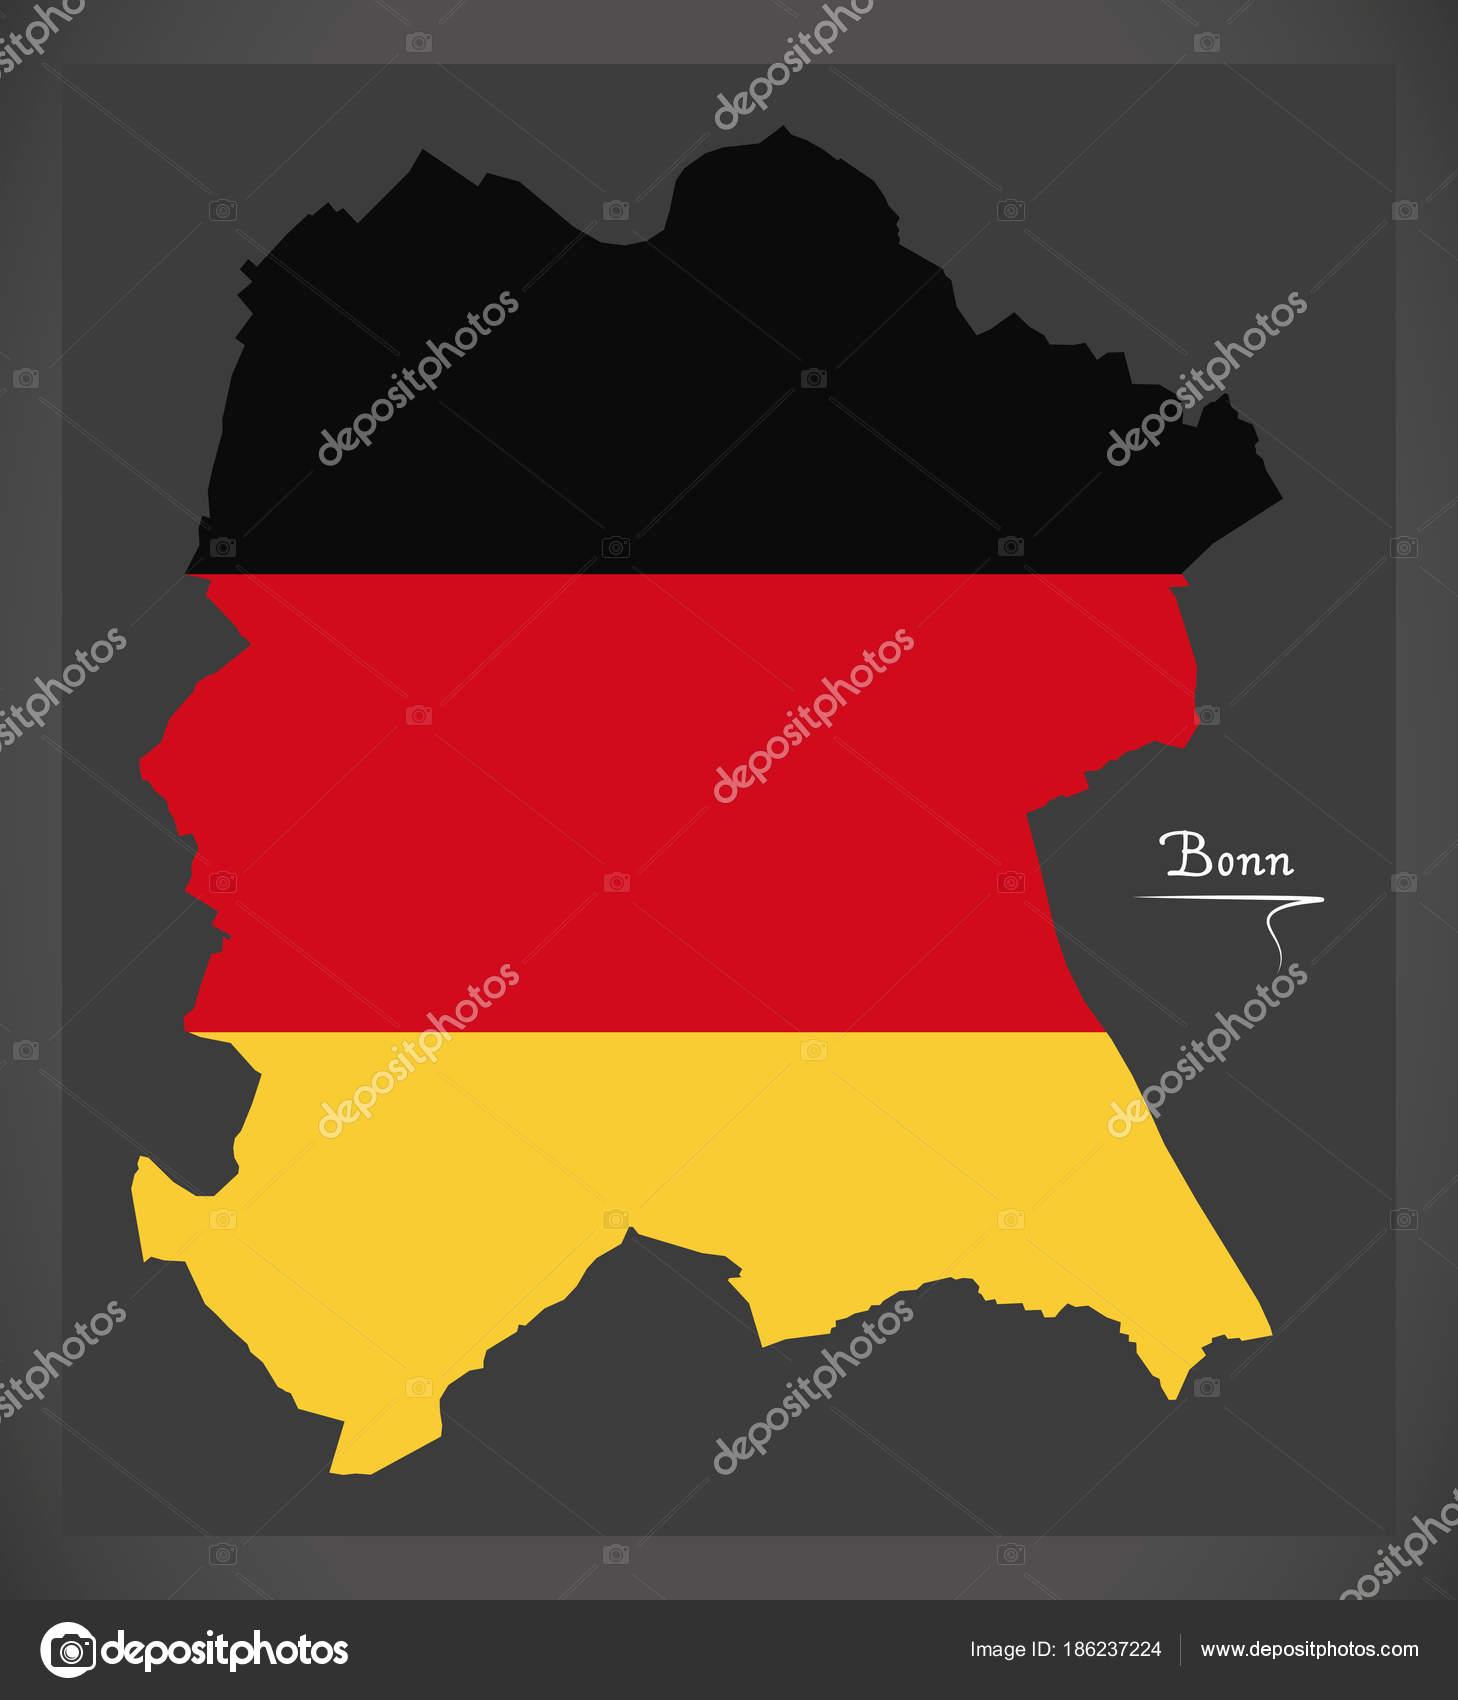 Bonn Karte.Bonn Karte Mit Deutschen Nationalflagge Illustration Stockvektor